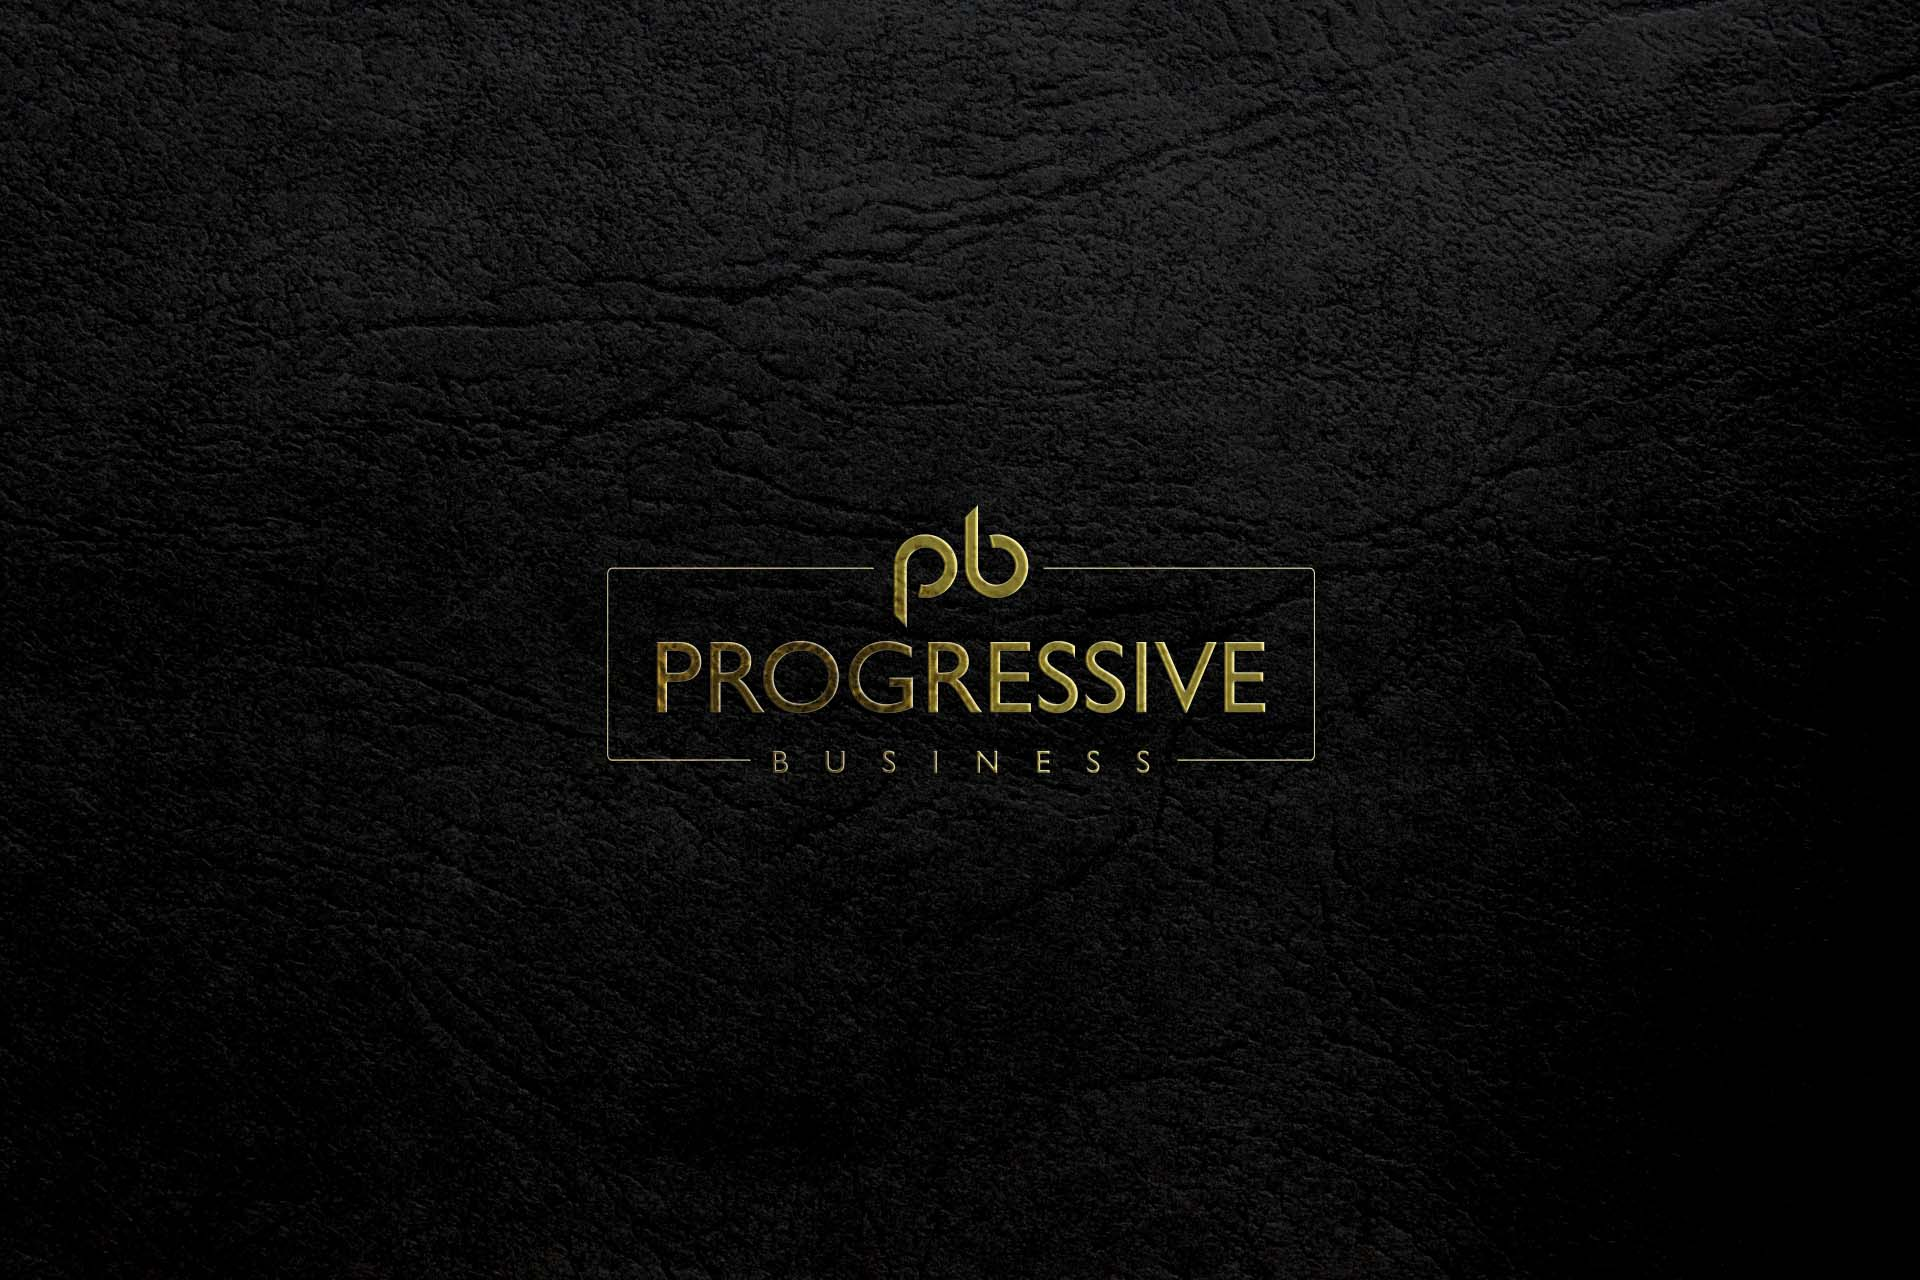 Logo Design by AKM Fazley Rabbi Faruque - Entry No. 136 in the Logo Design Contest Captivating Logo Design for Progressive Business.